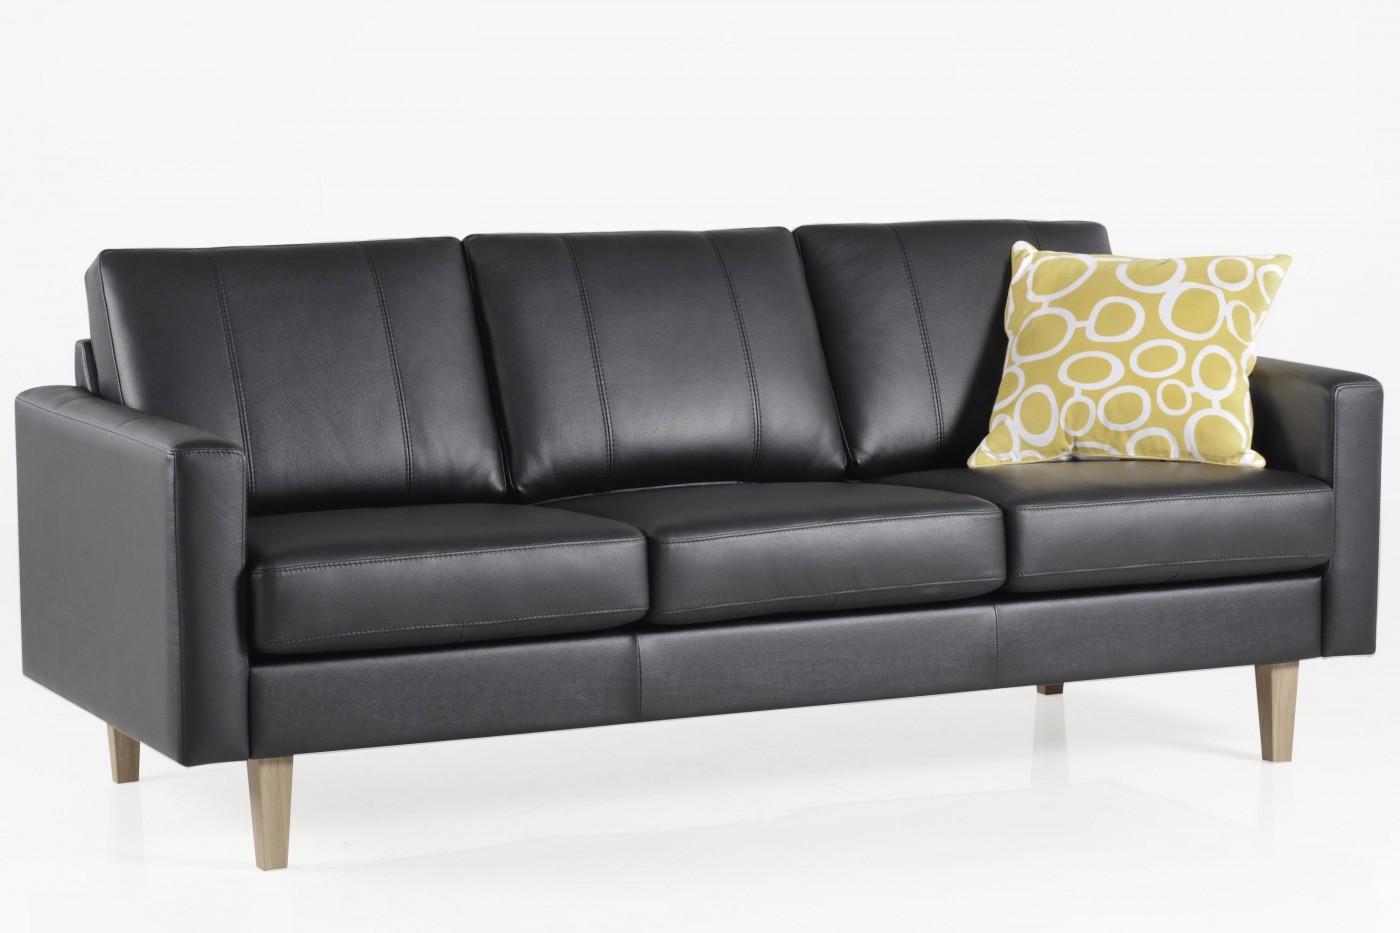 Sotka sohva takuu